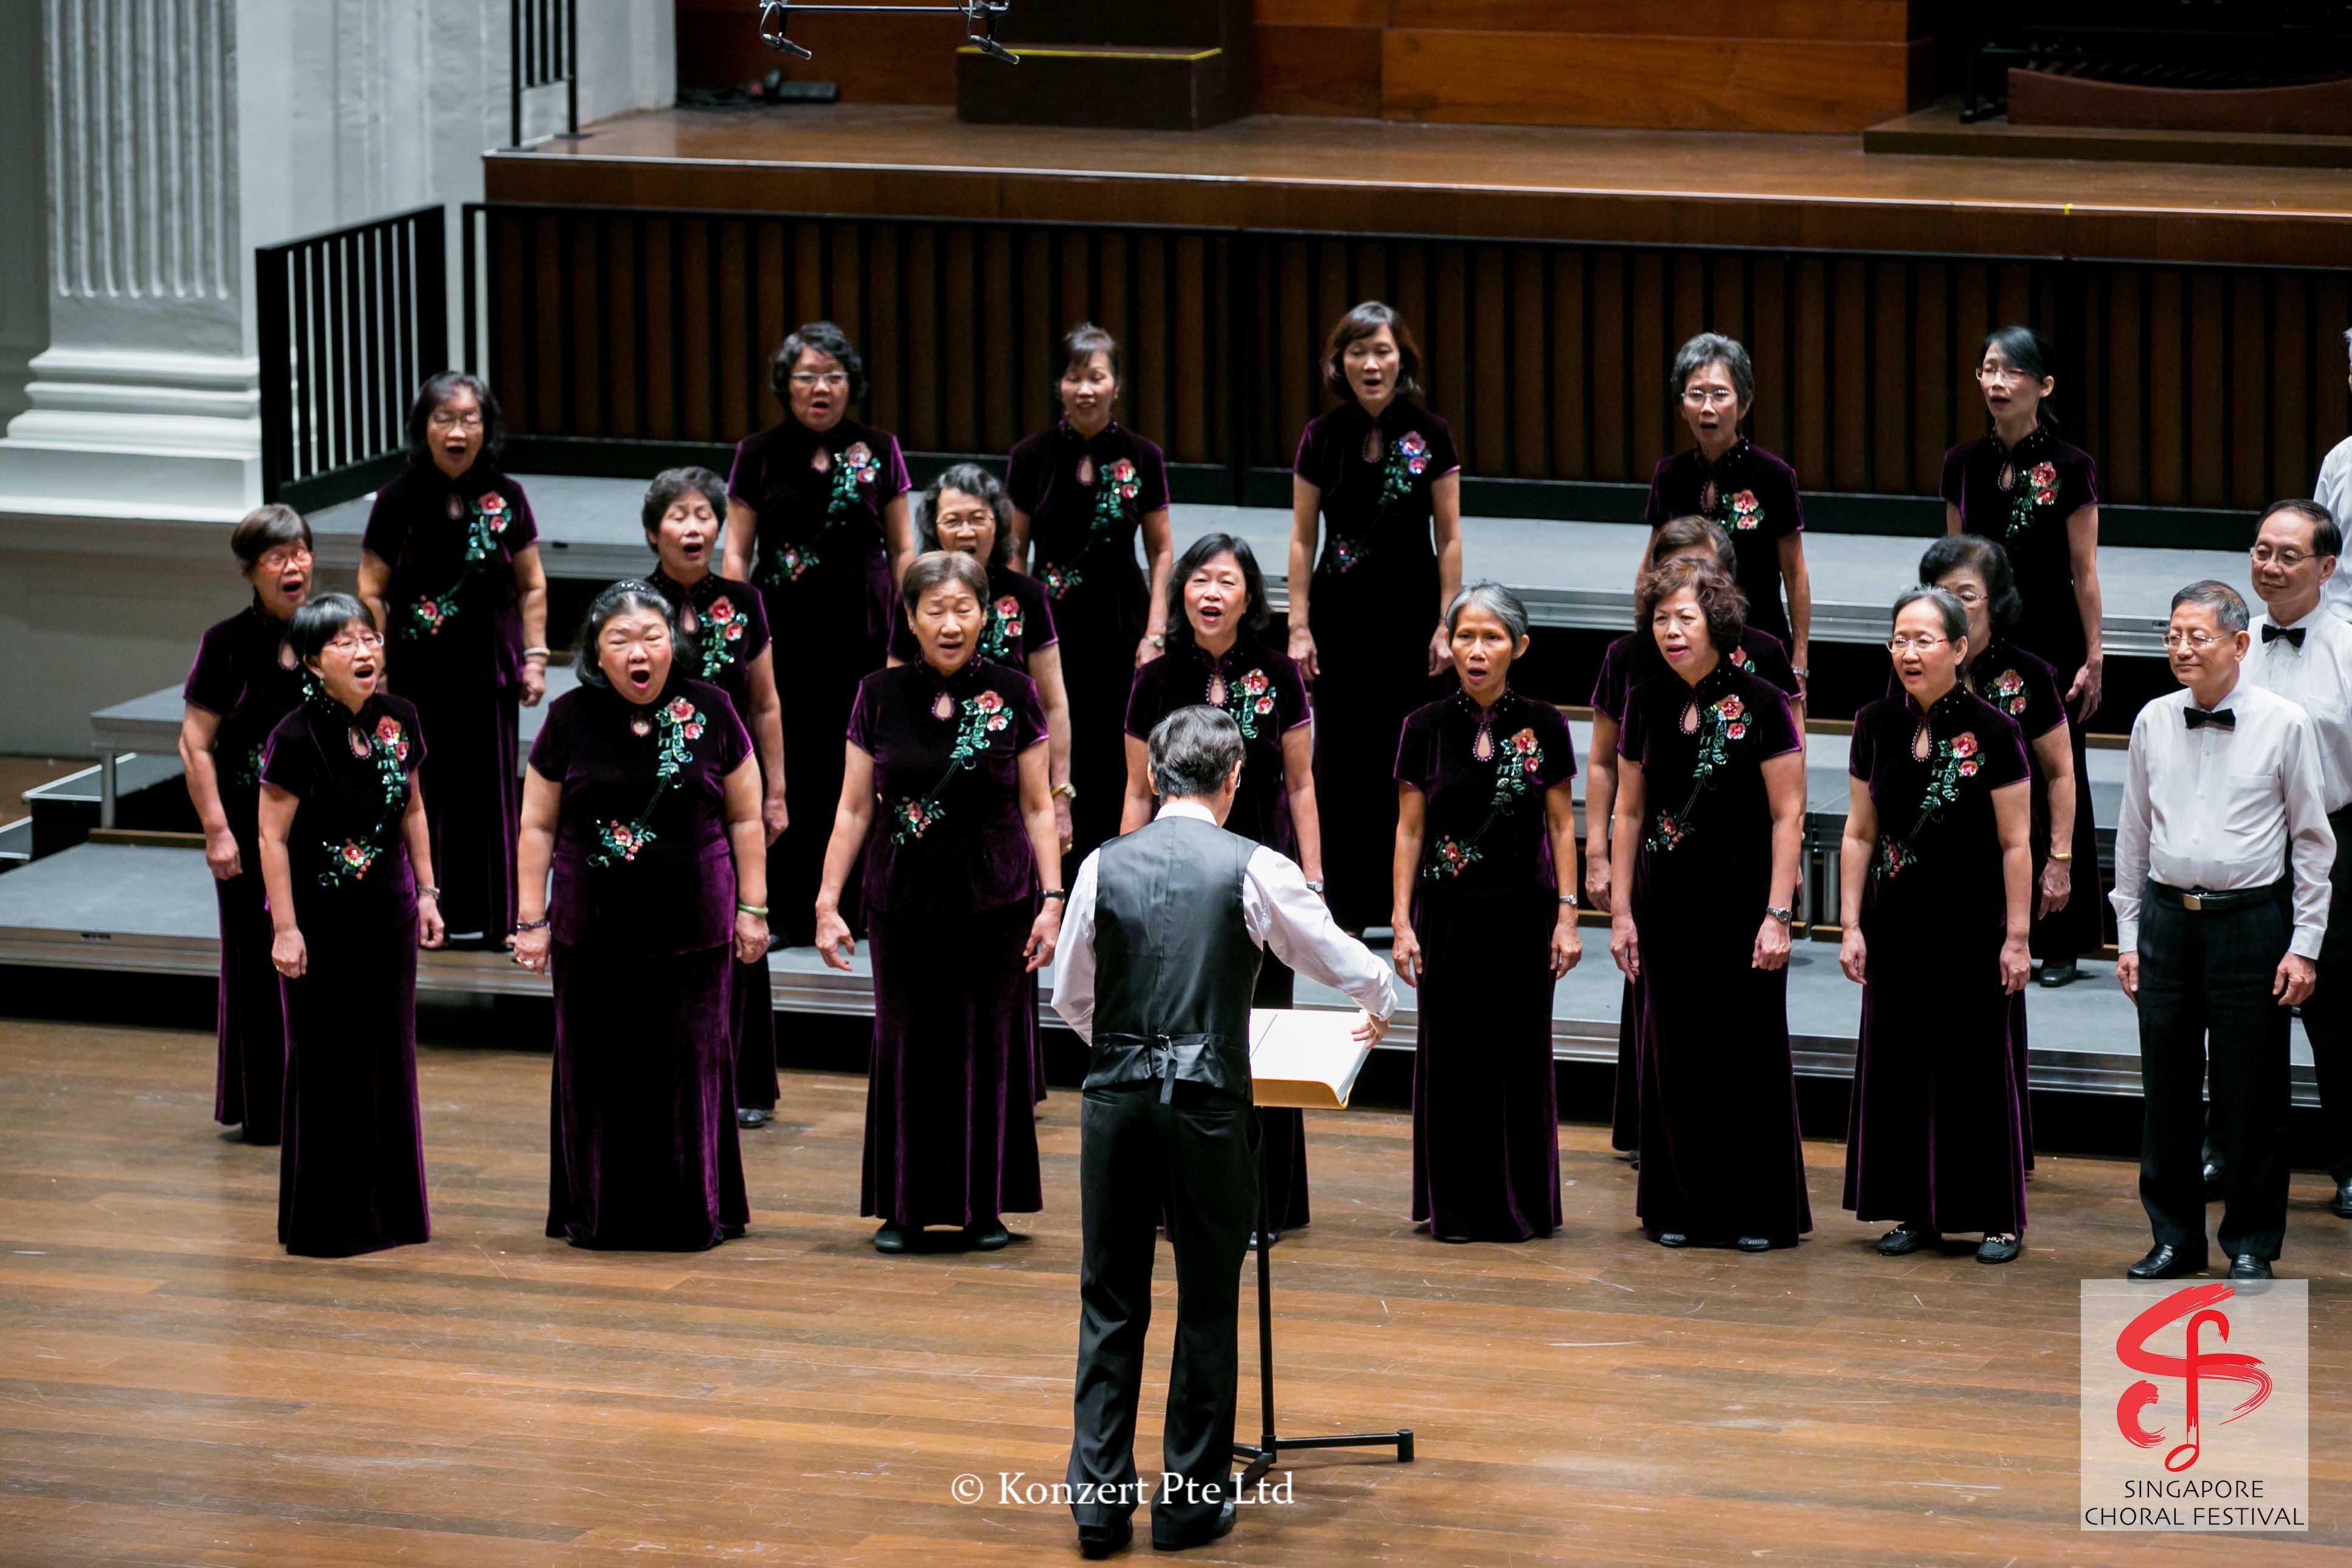 Singapore Choral Festival 8-8-15 (202).jpg